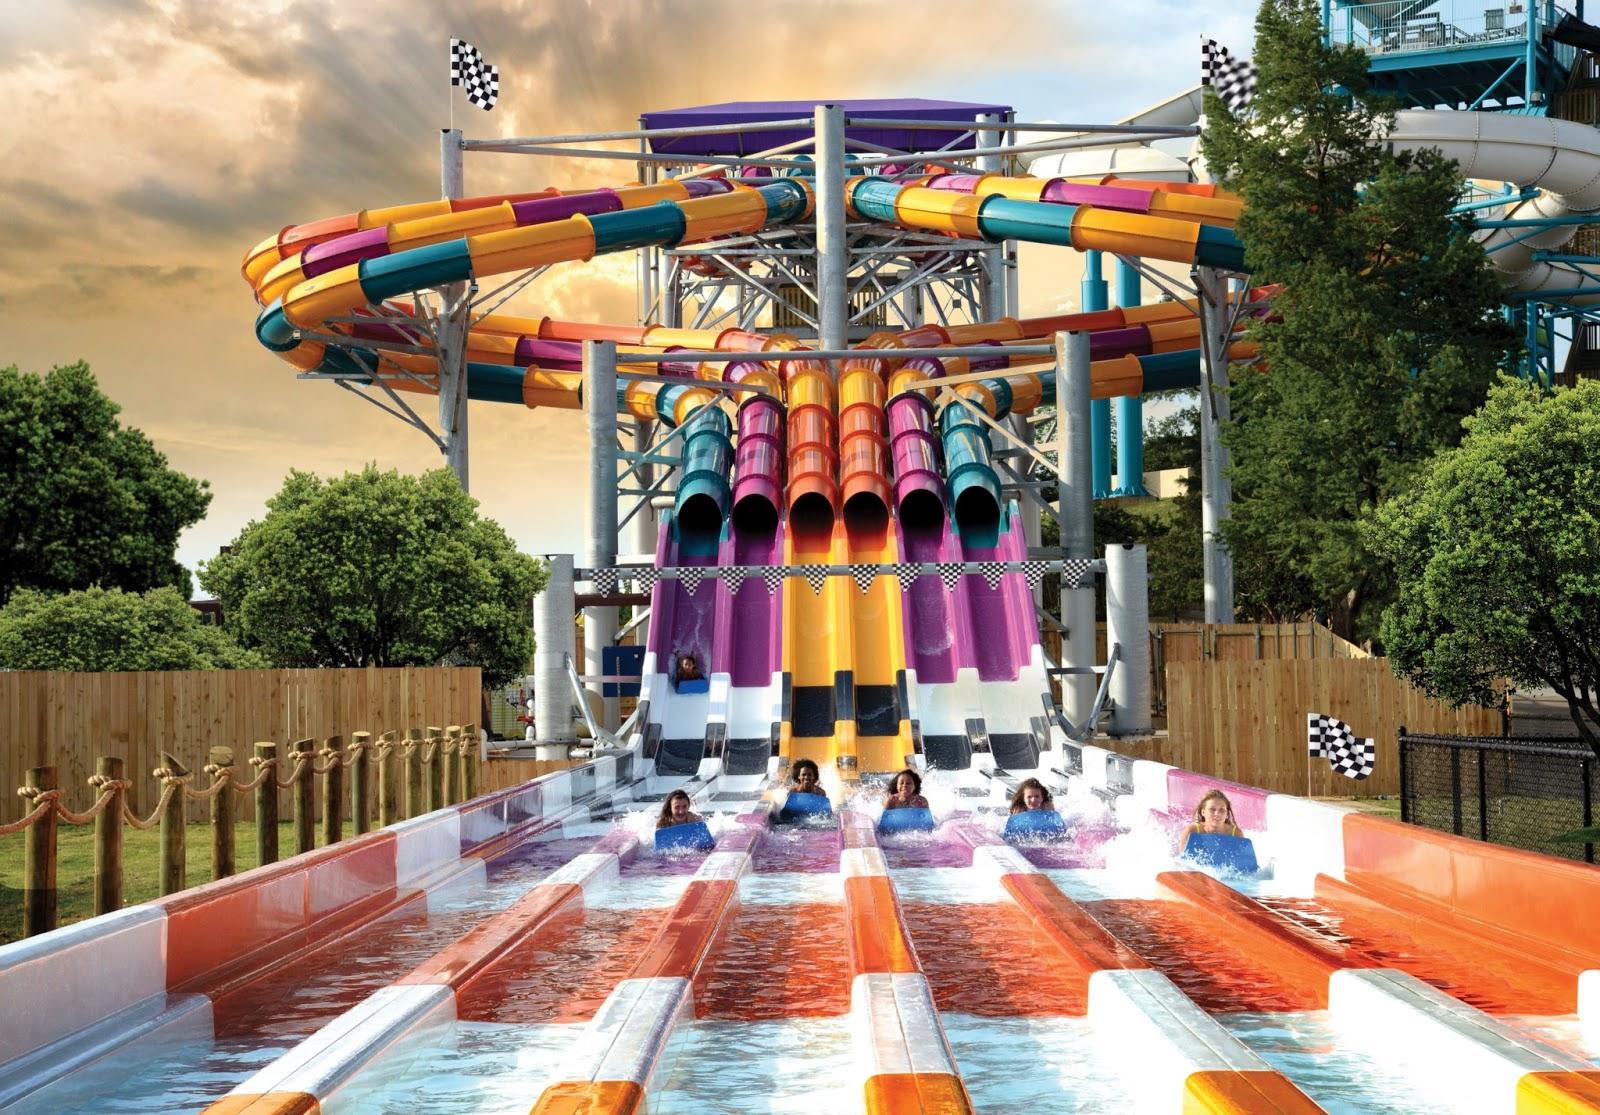 Parqueplaza Net Novedades 2016 En Los Parques Six Flags